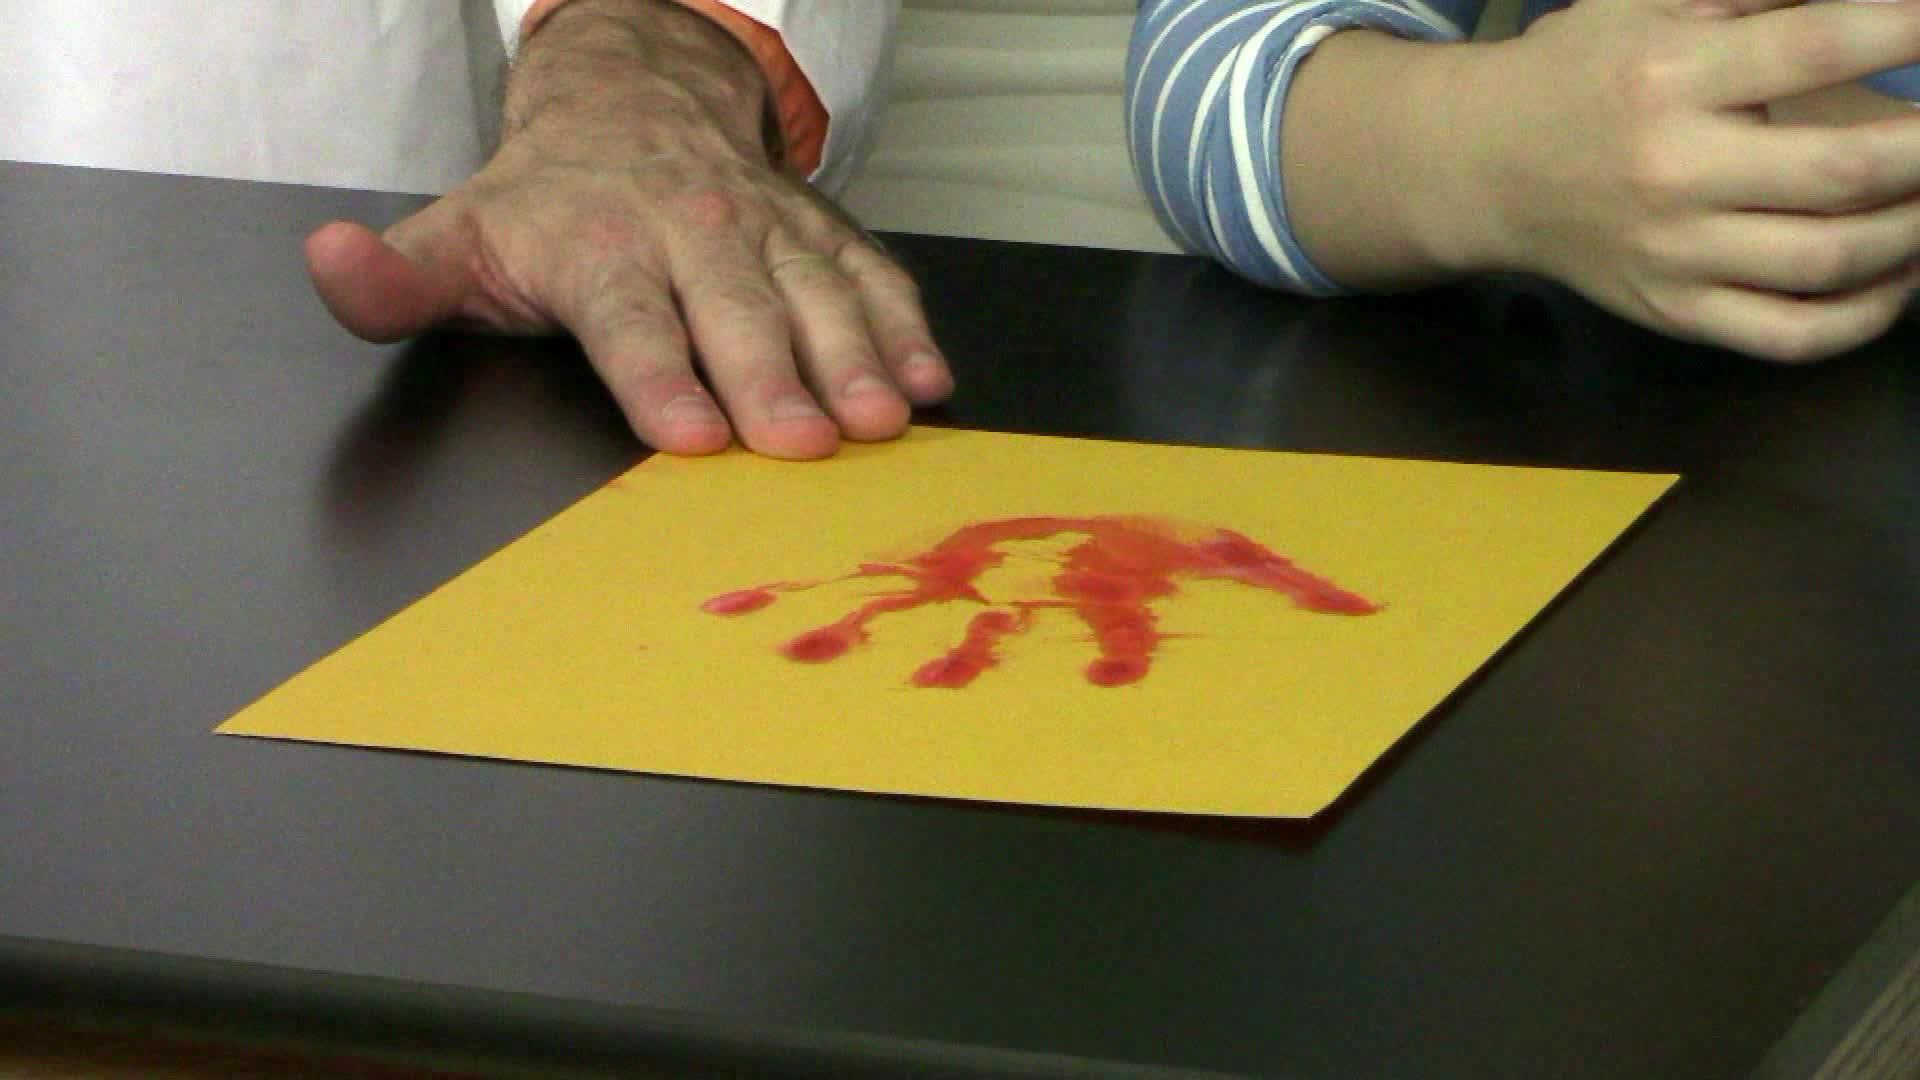 Bleeding Paper